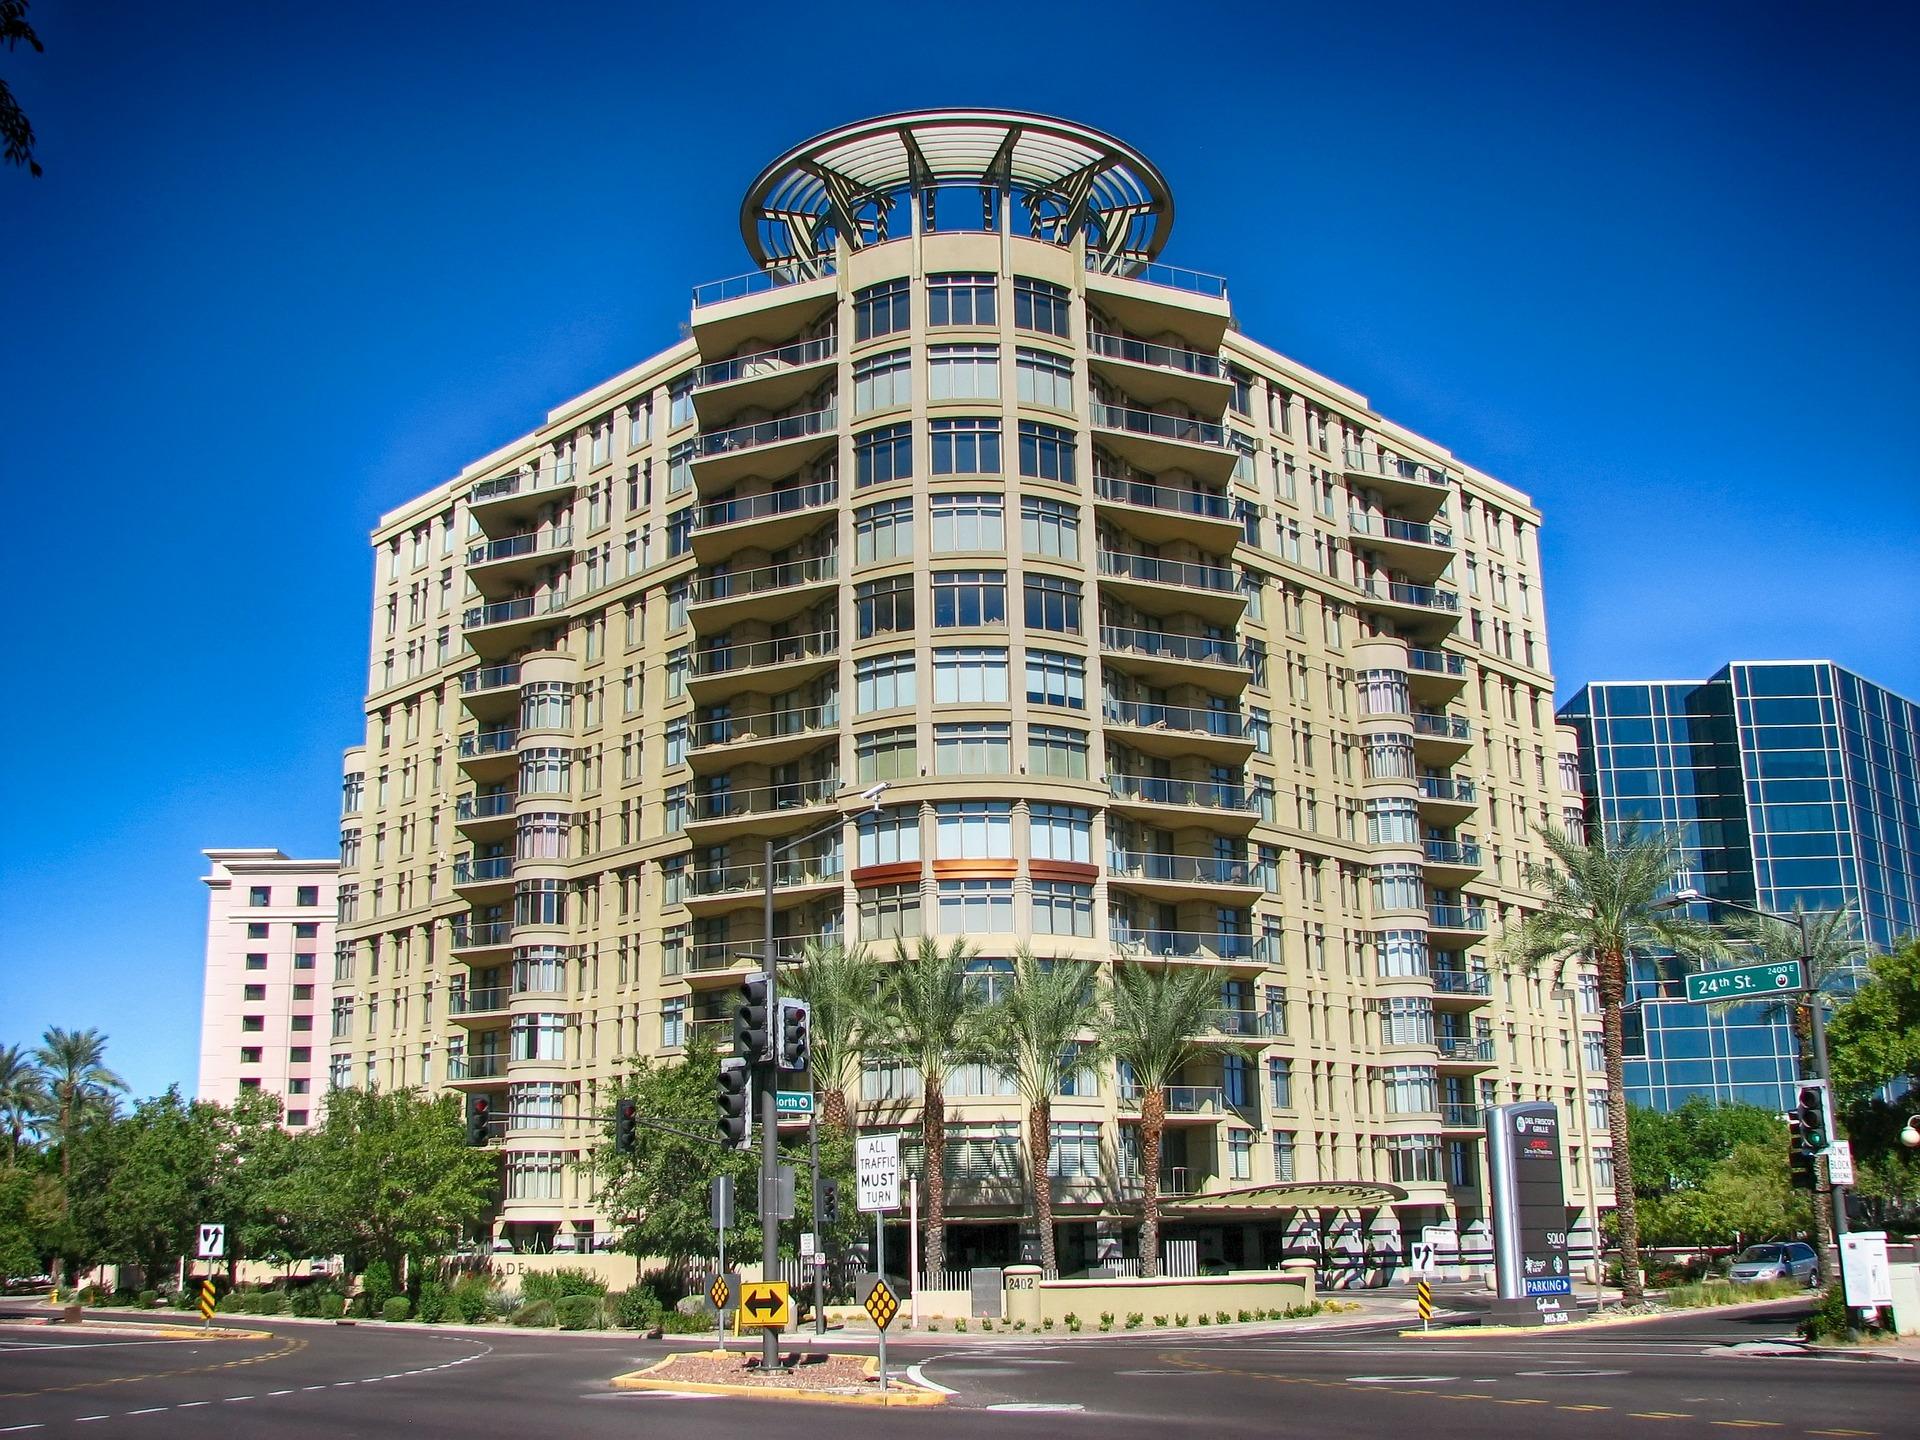 Mesa, Arizona answering service - PCNAnswers helps many Mesa small businesses